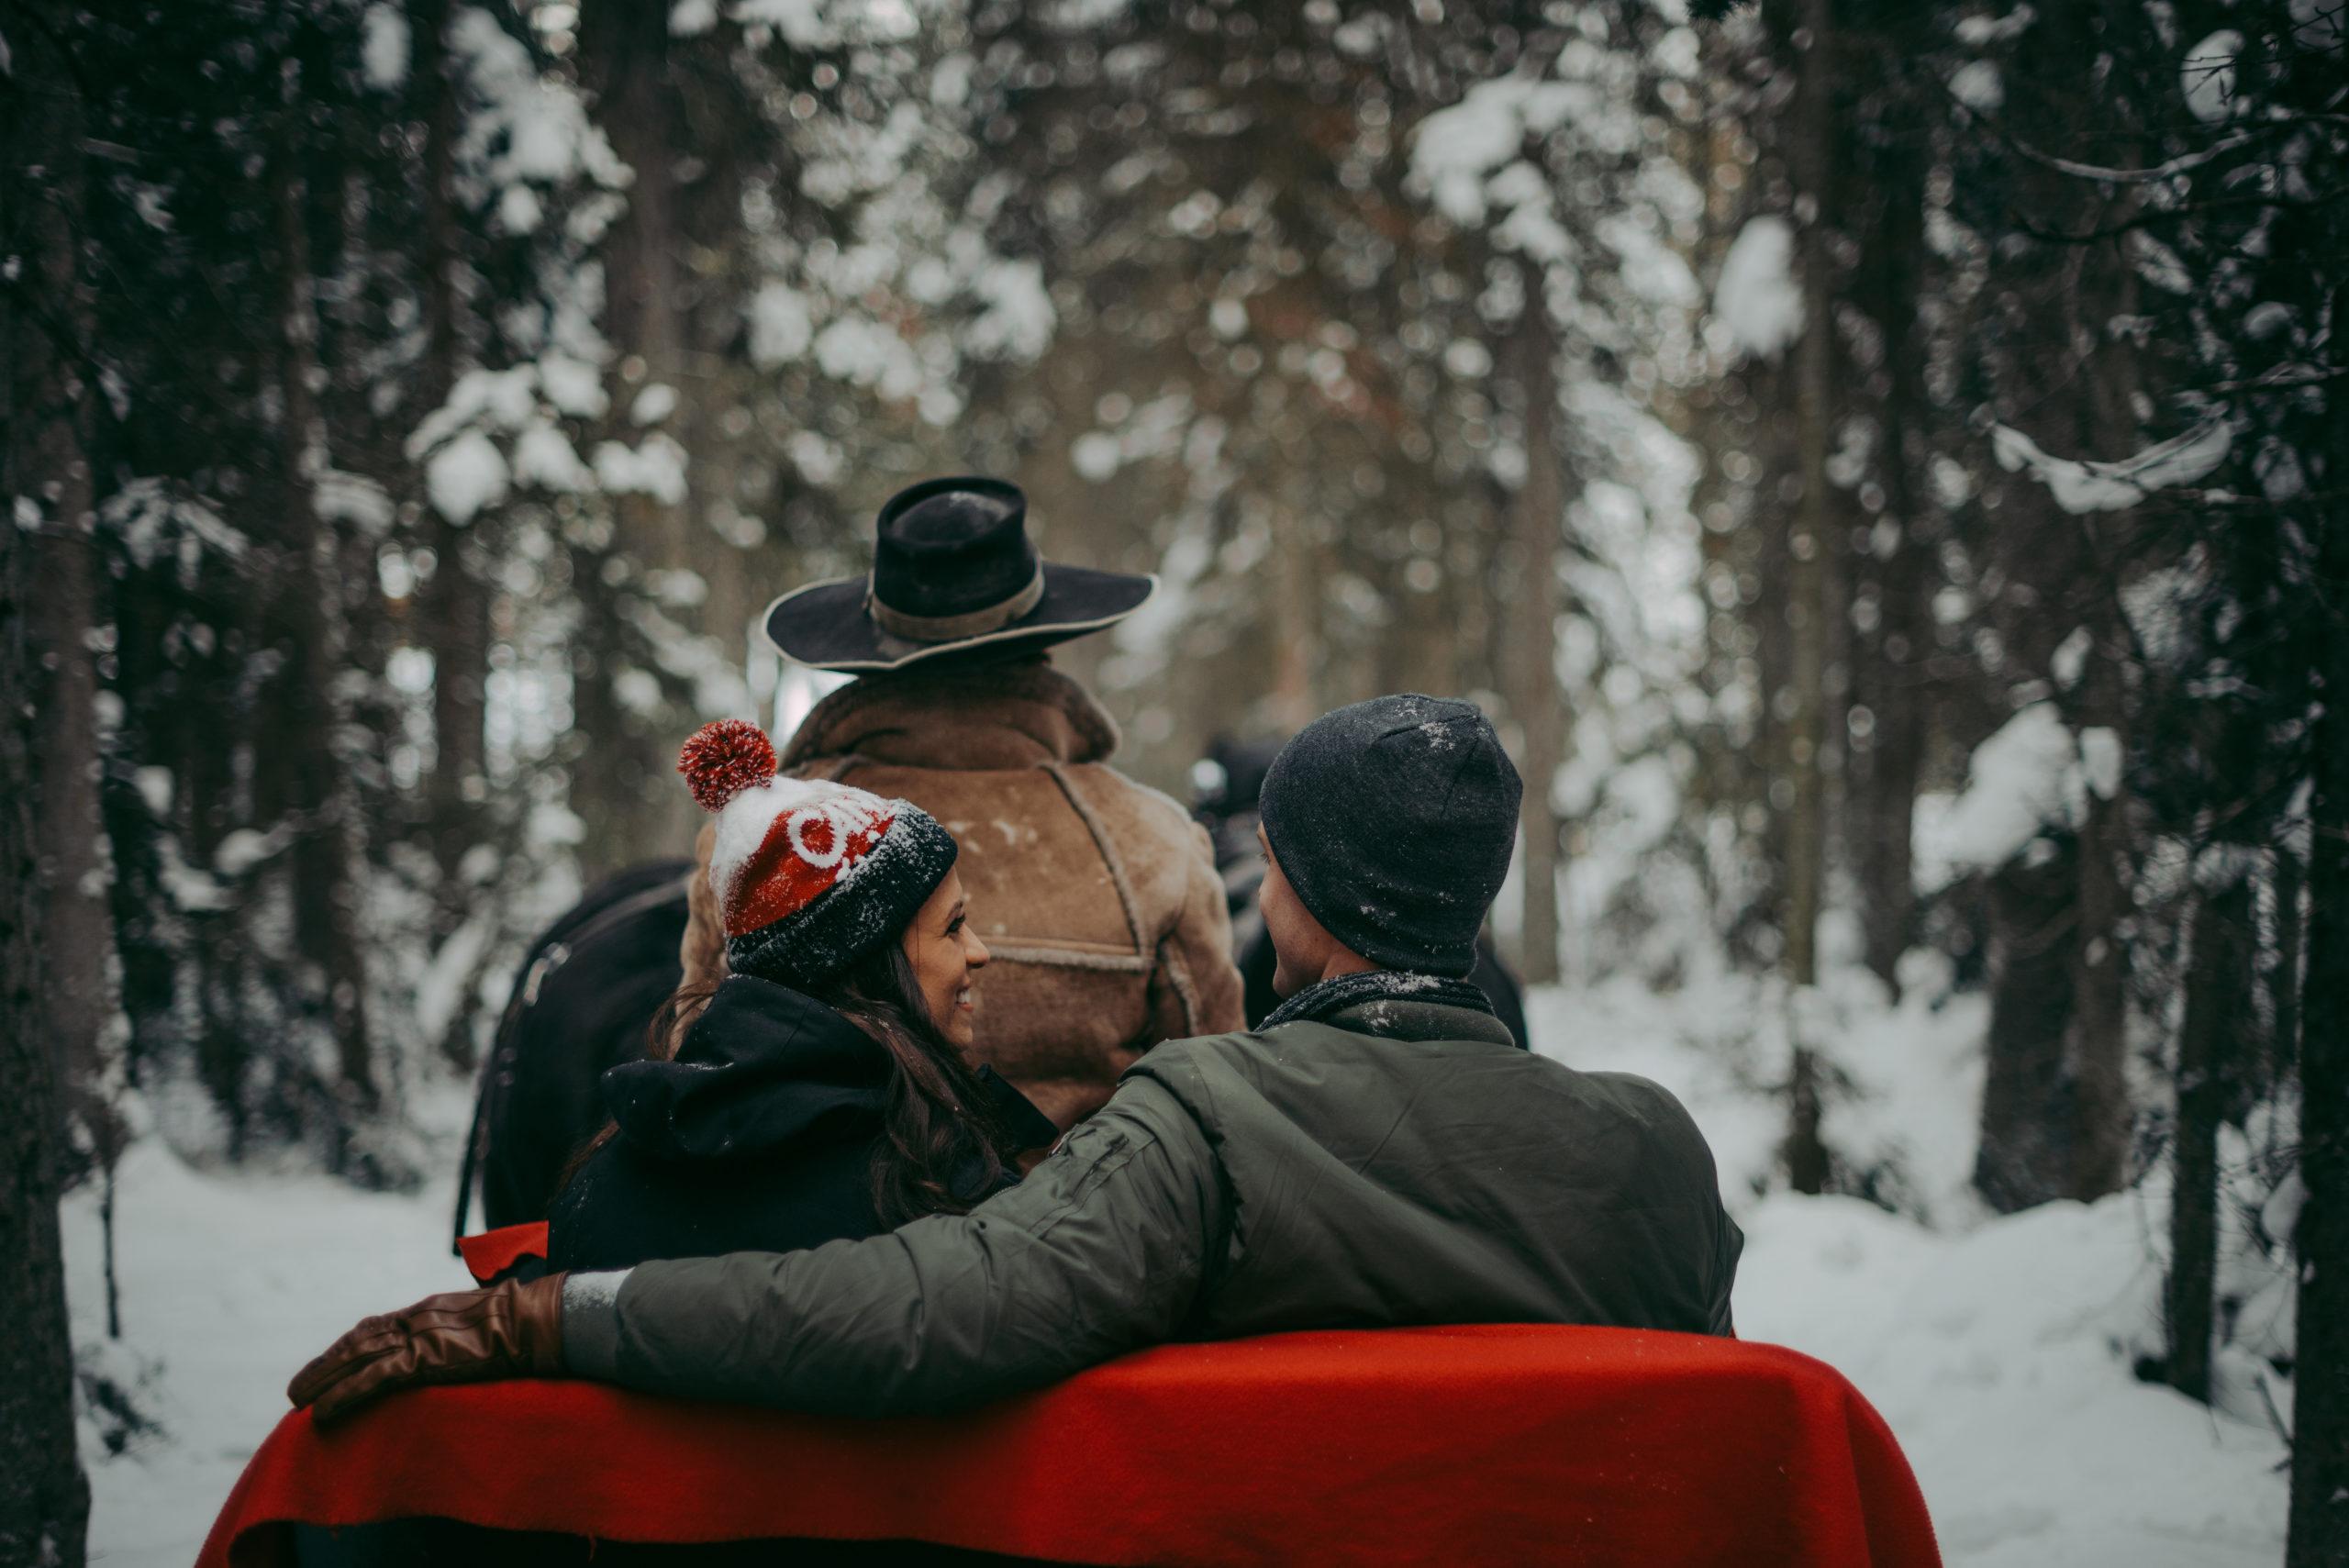 Sleigh Ride Christmas in the Rockies Celestine Aerden